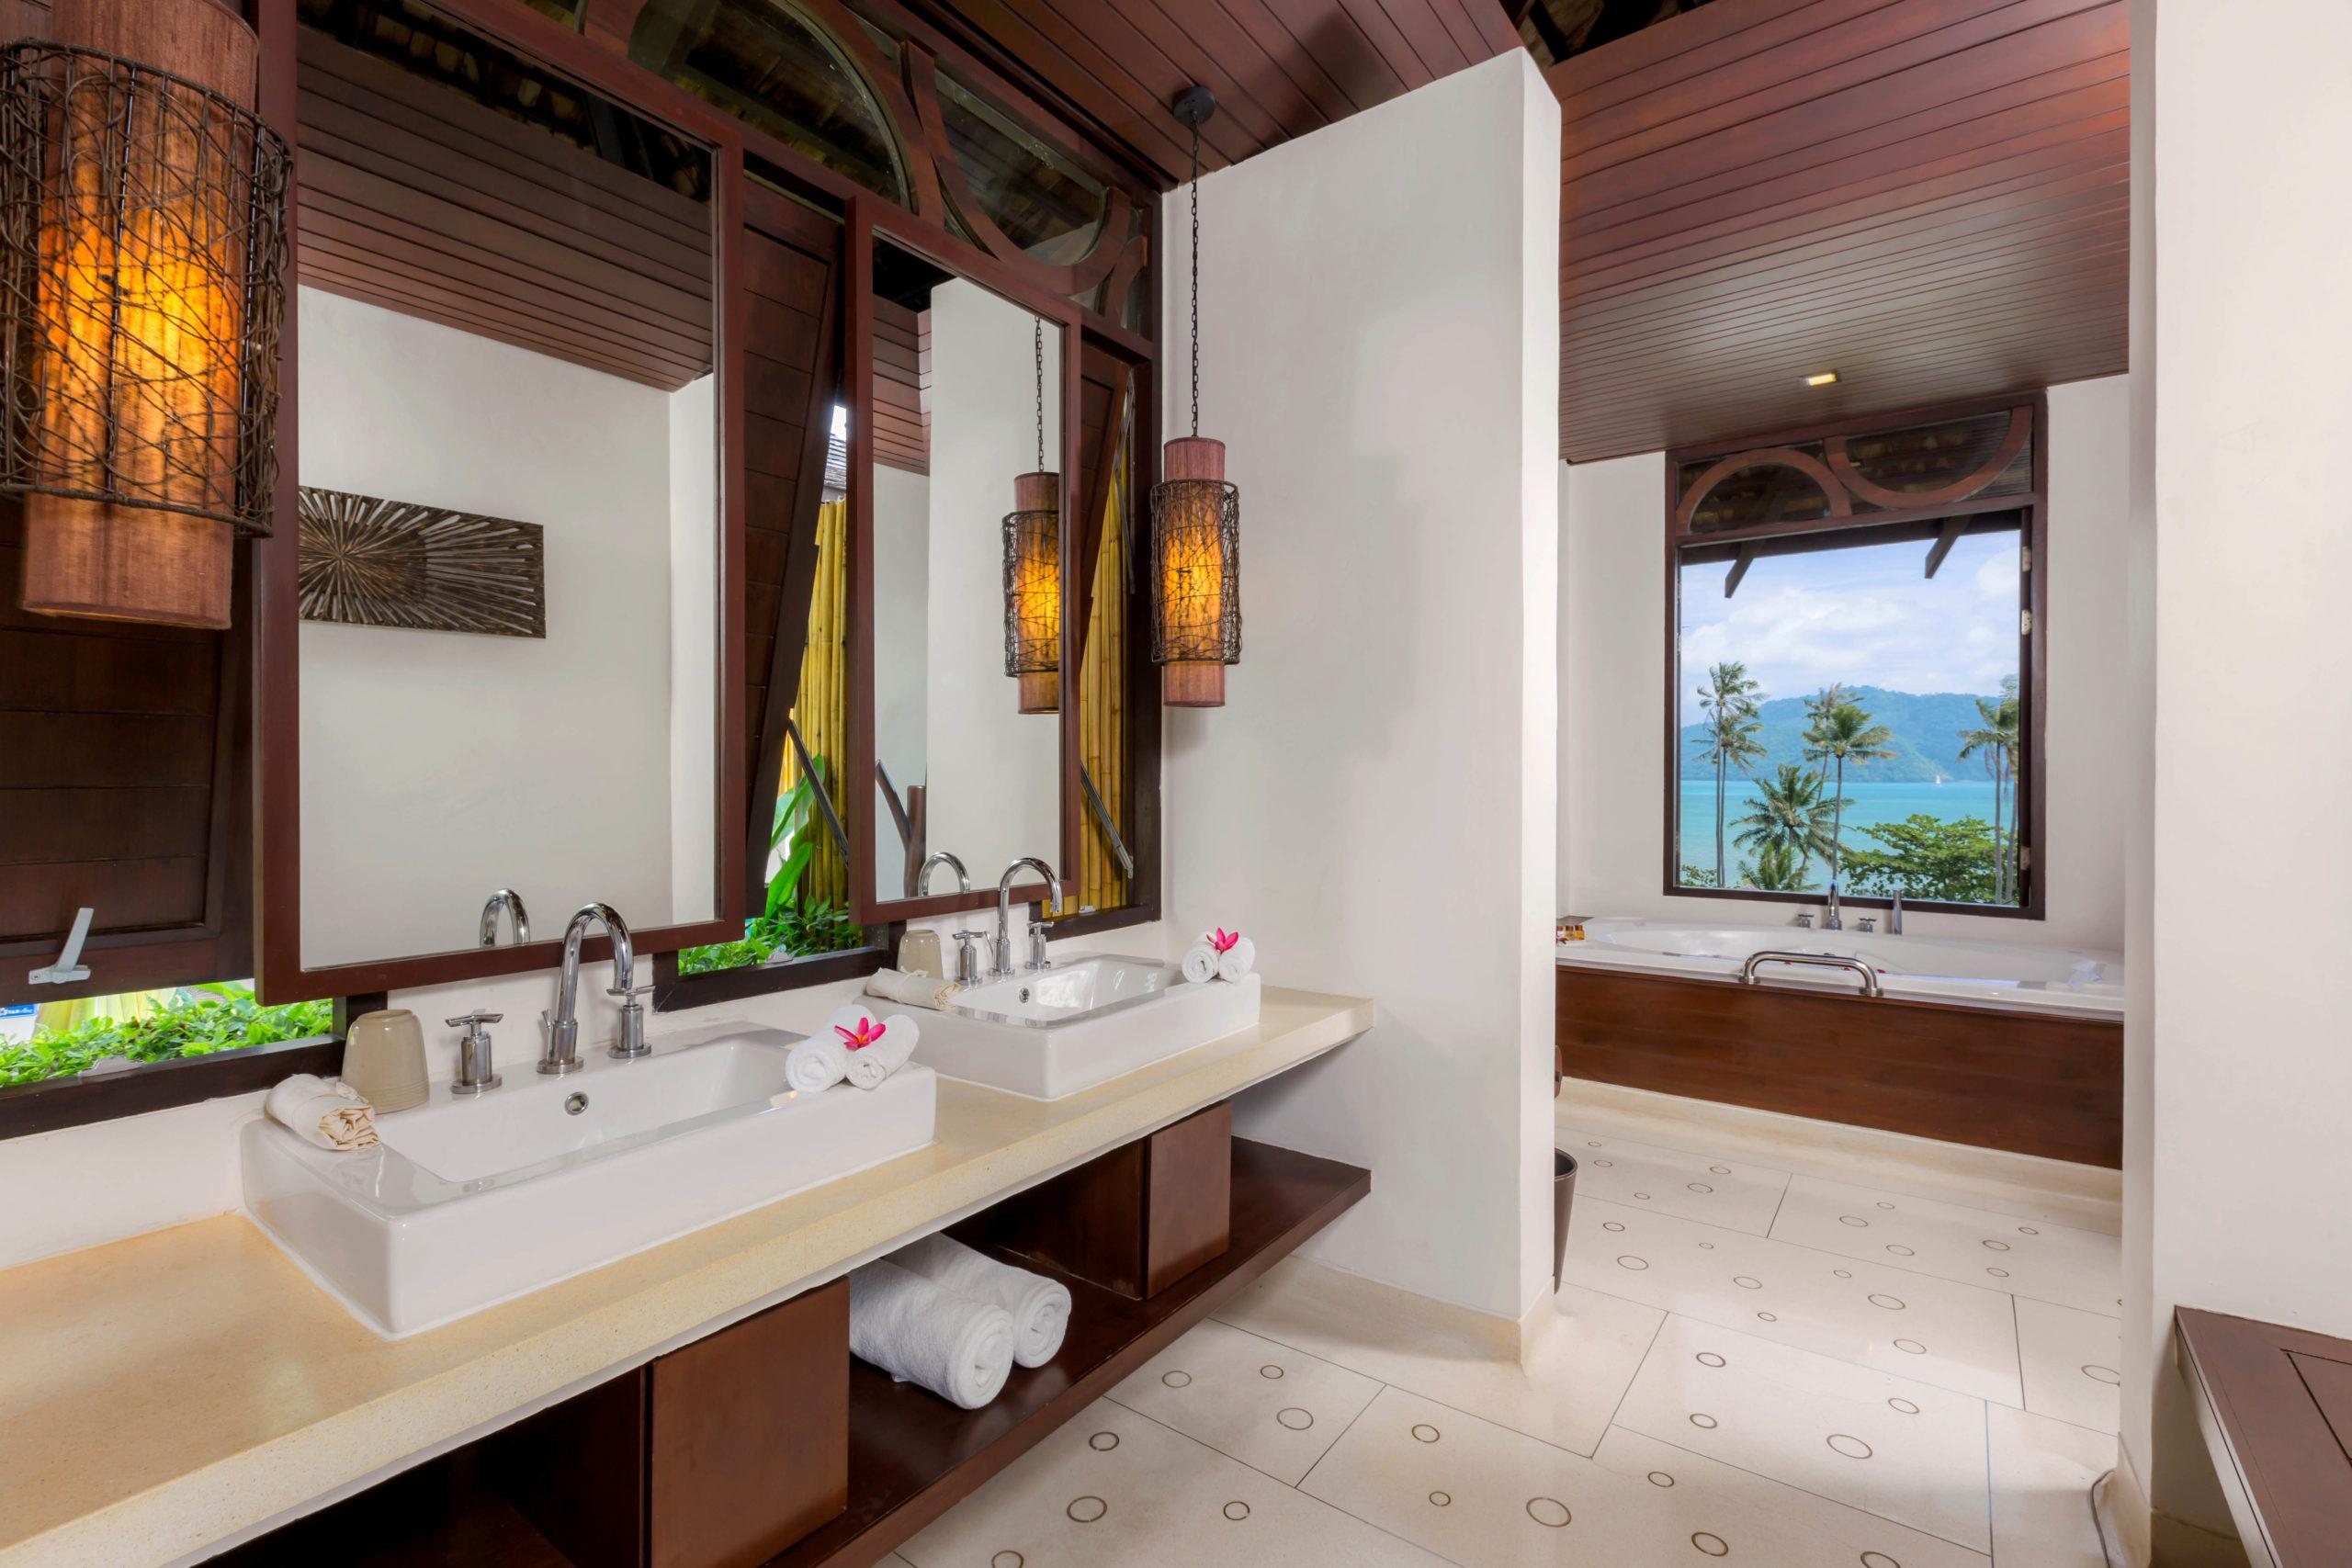 007_Deluxe Seaview Villa_Bathroom The Vijitt Resort Phuket